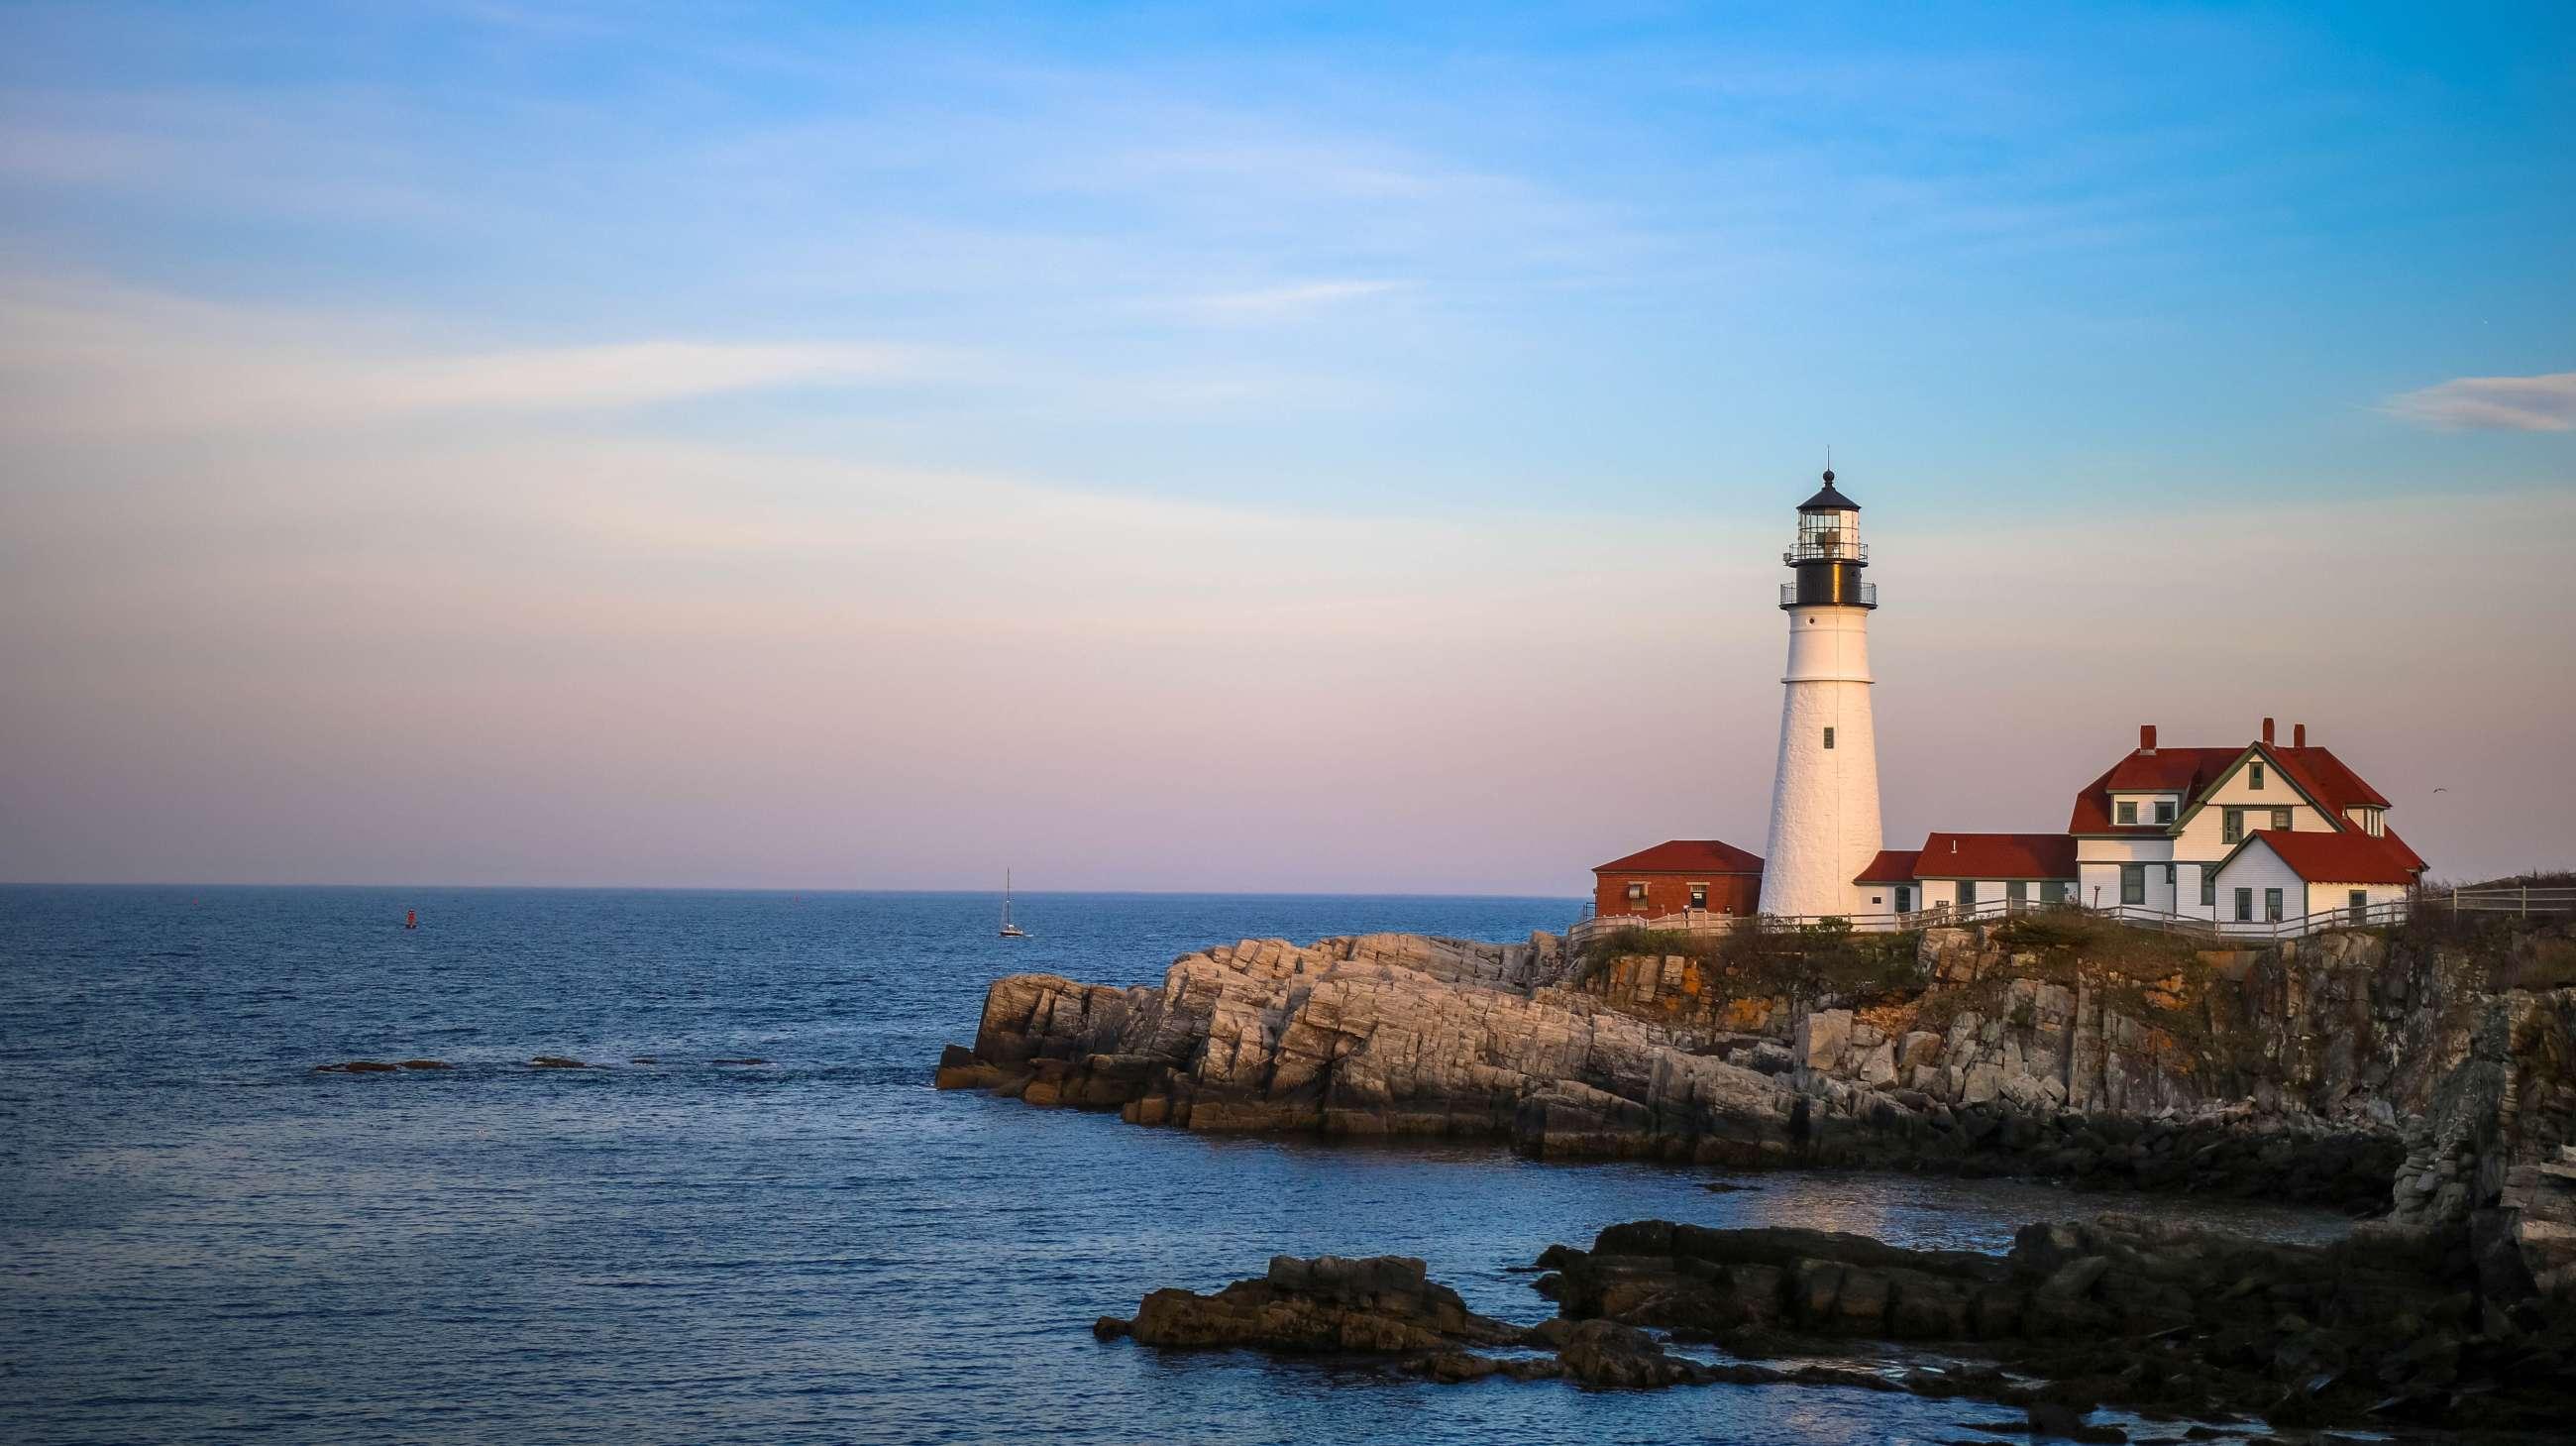 Lighthouse off the East Coast